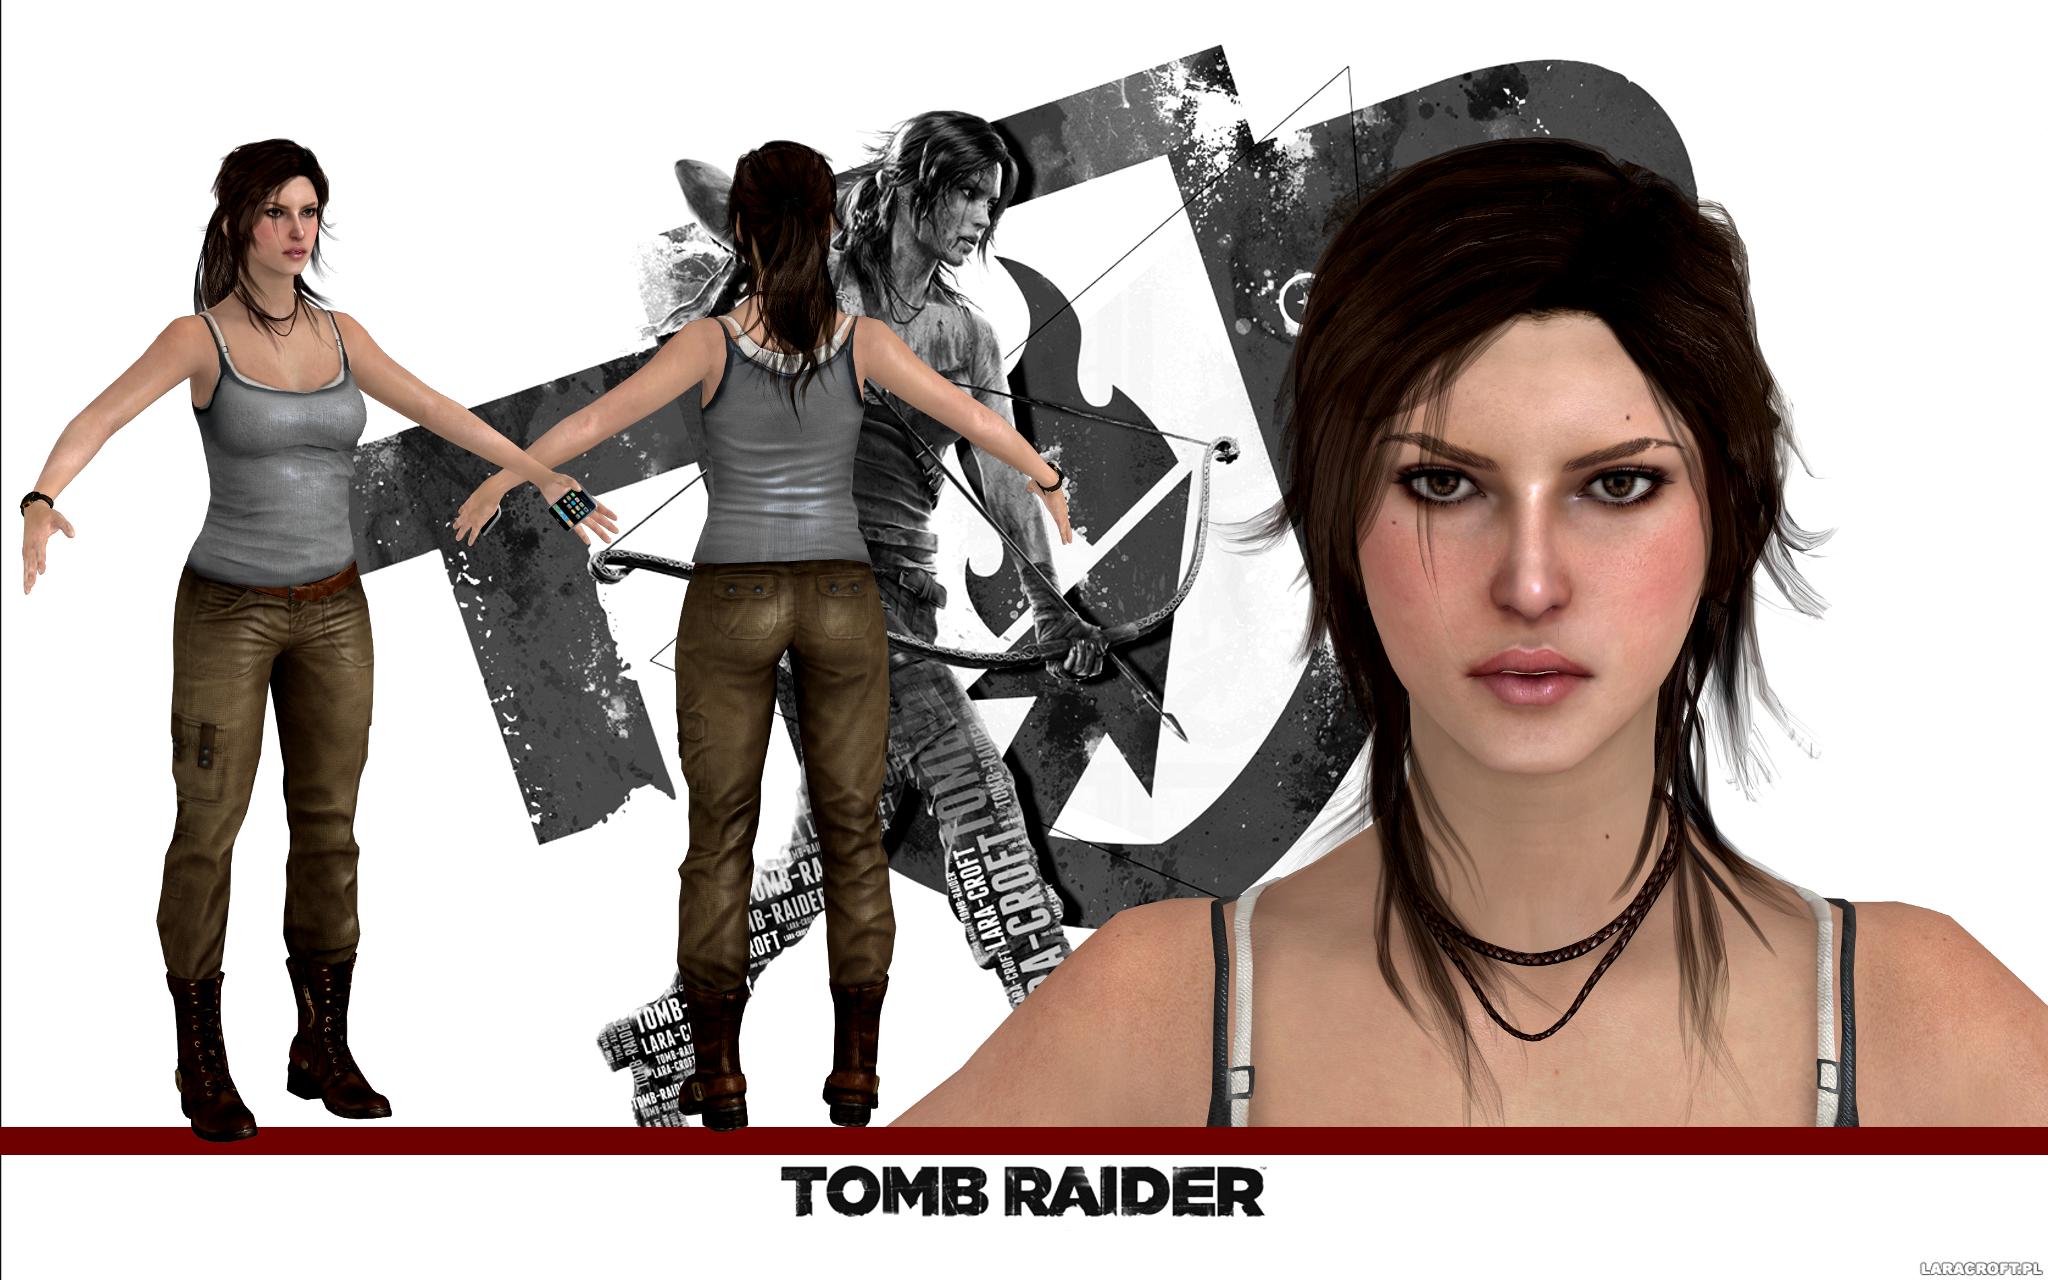 Tomb Raider Lara Croft Model Release By Konradm96 On Deviantart